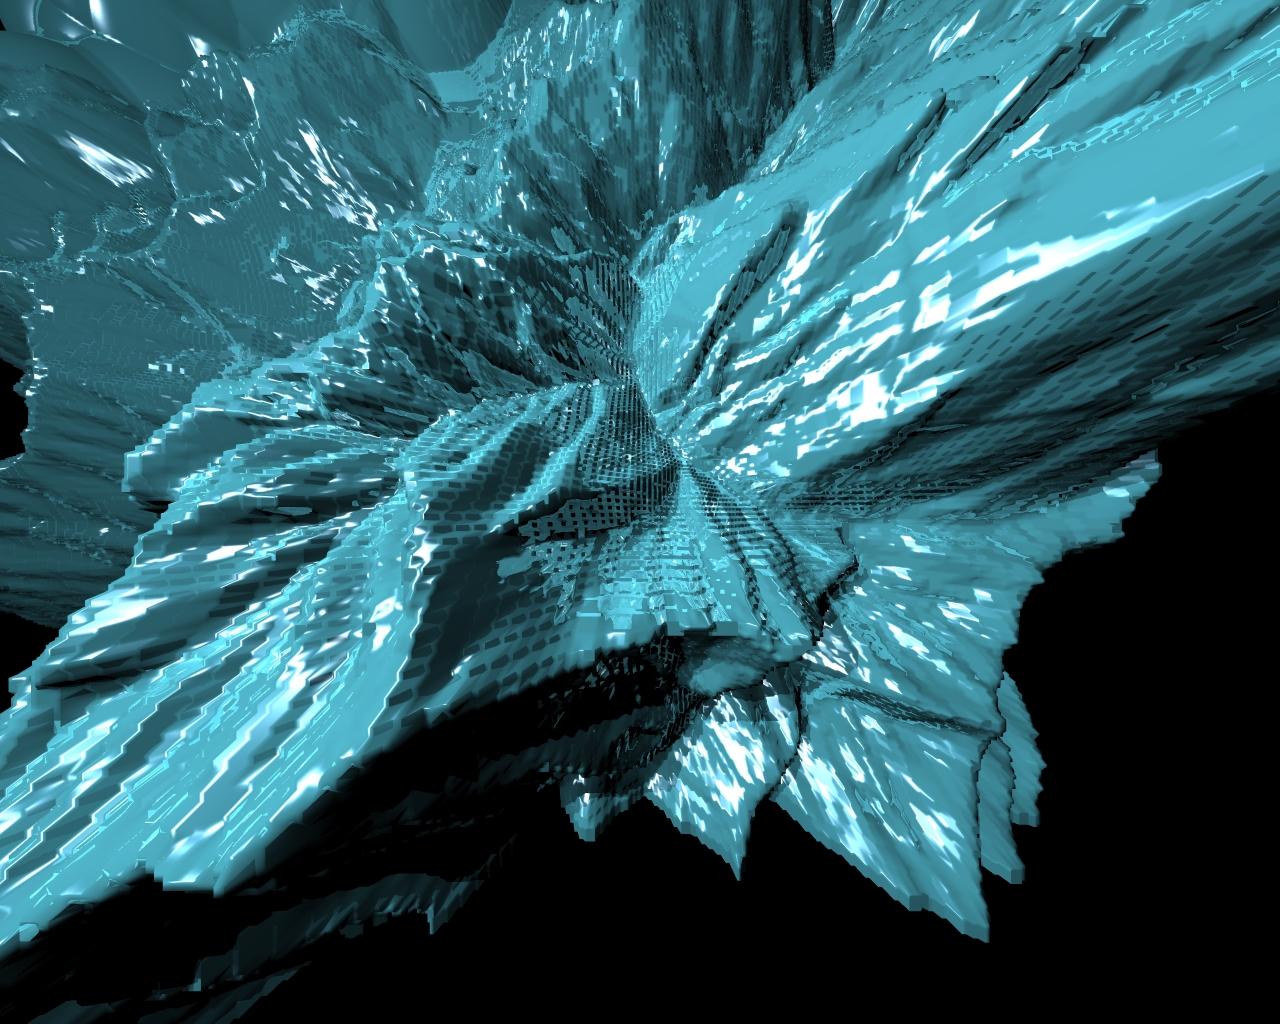 Beautiful Wallpaper Mountain Art - an_ice_mountain  Image_142720.jpg